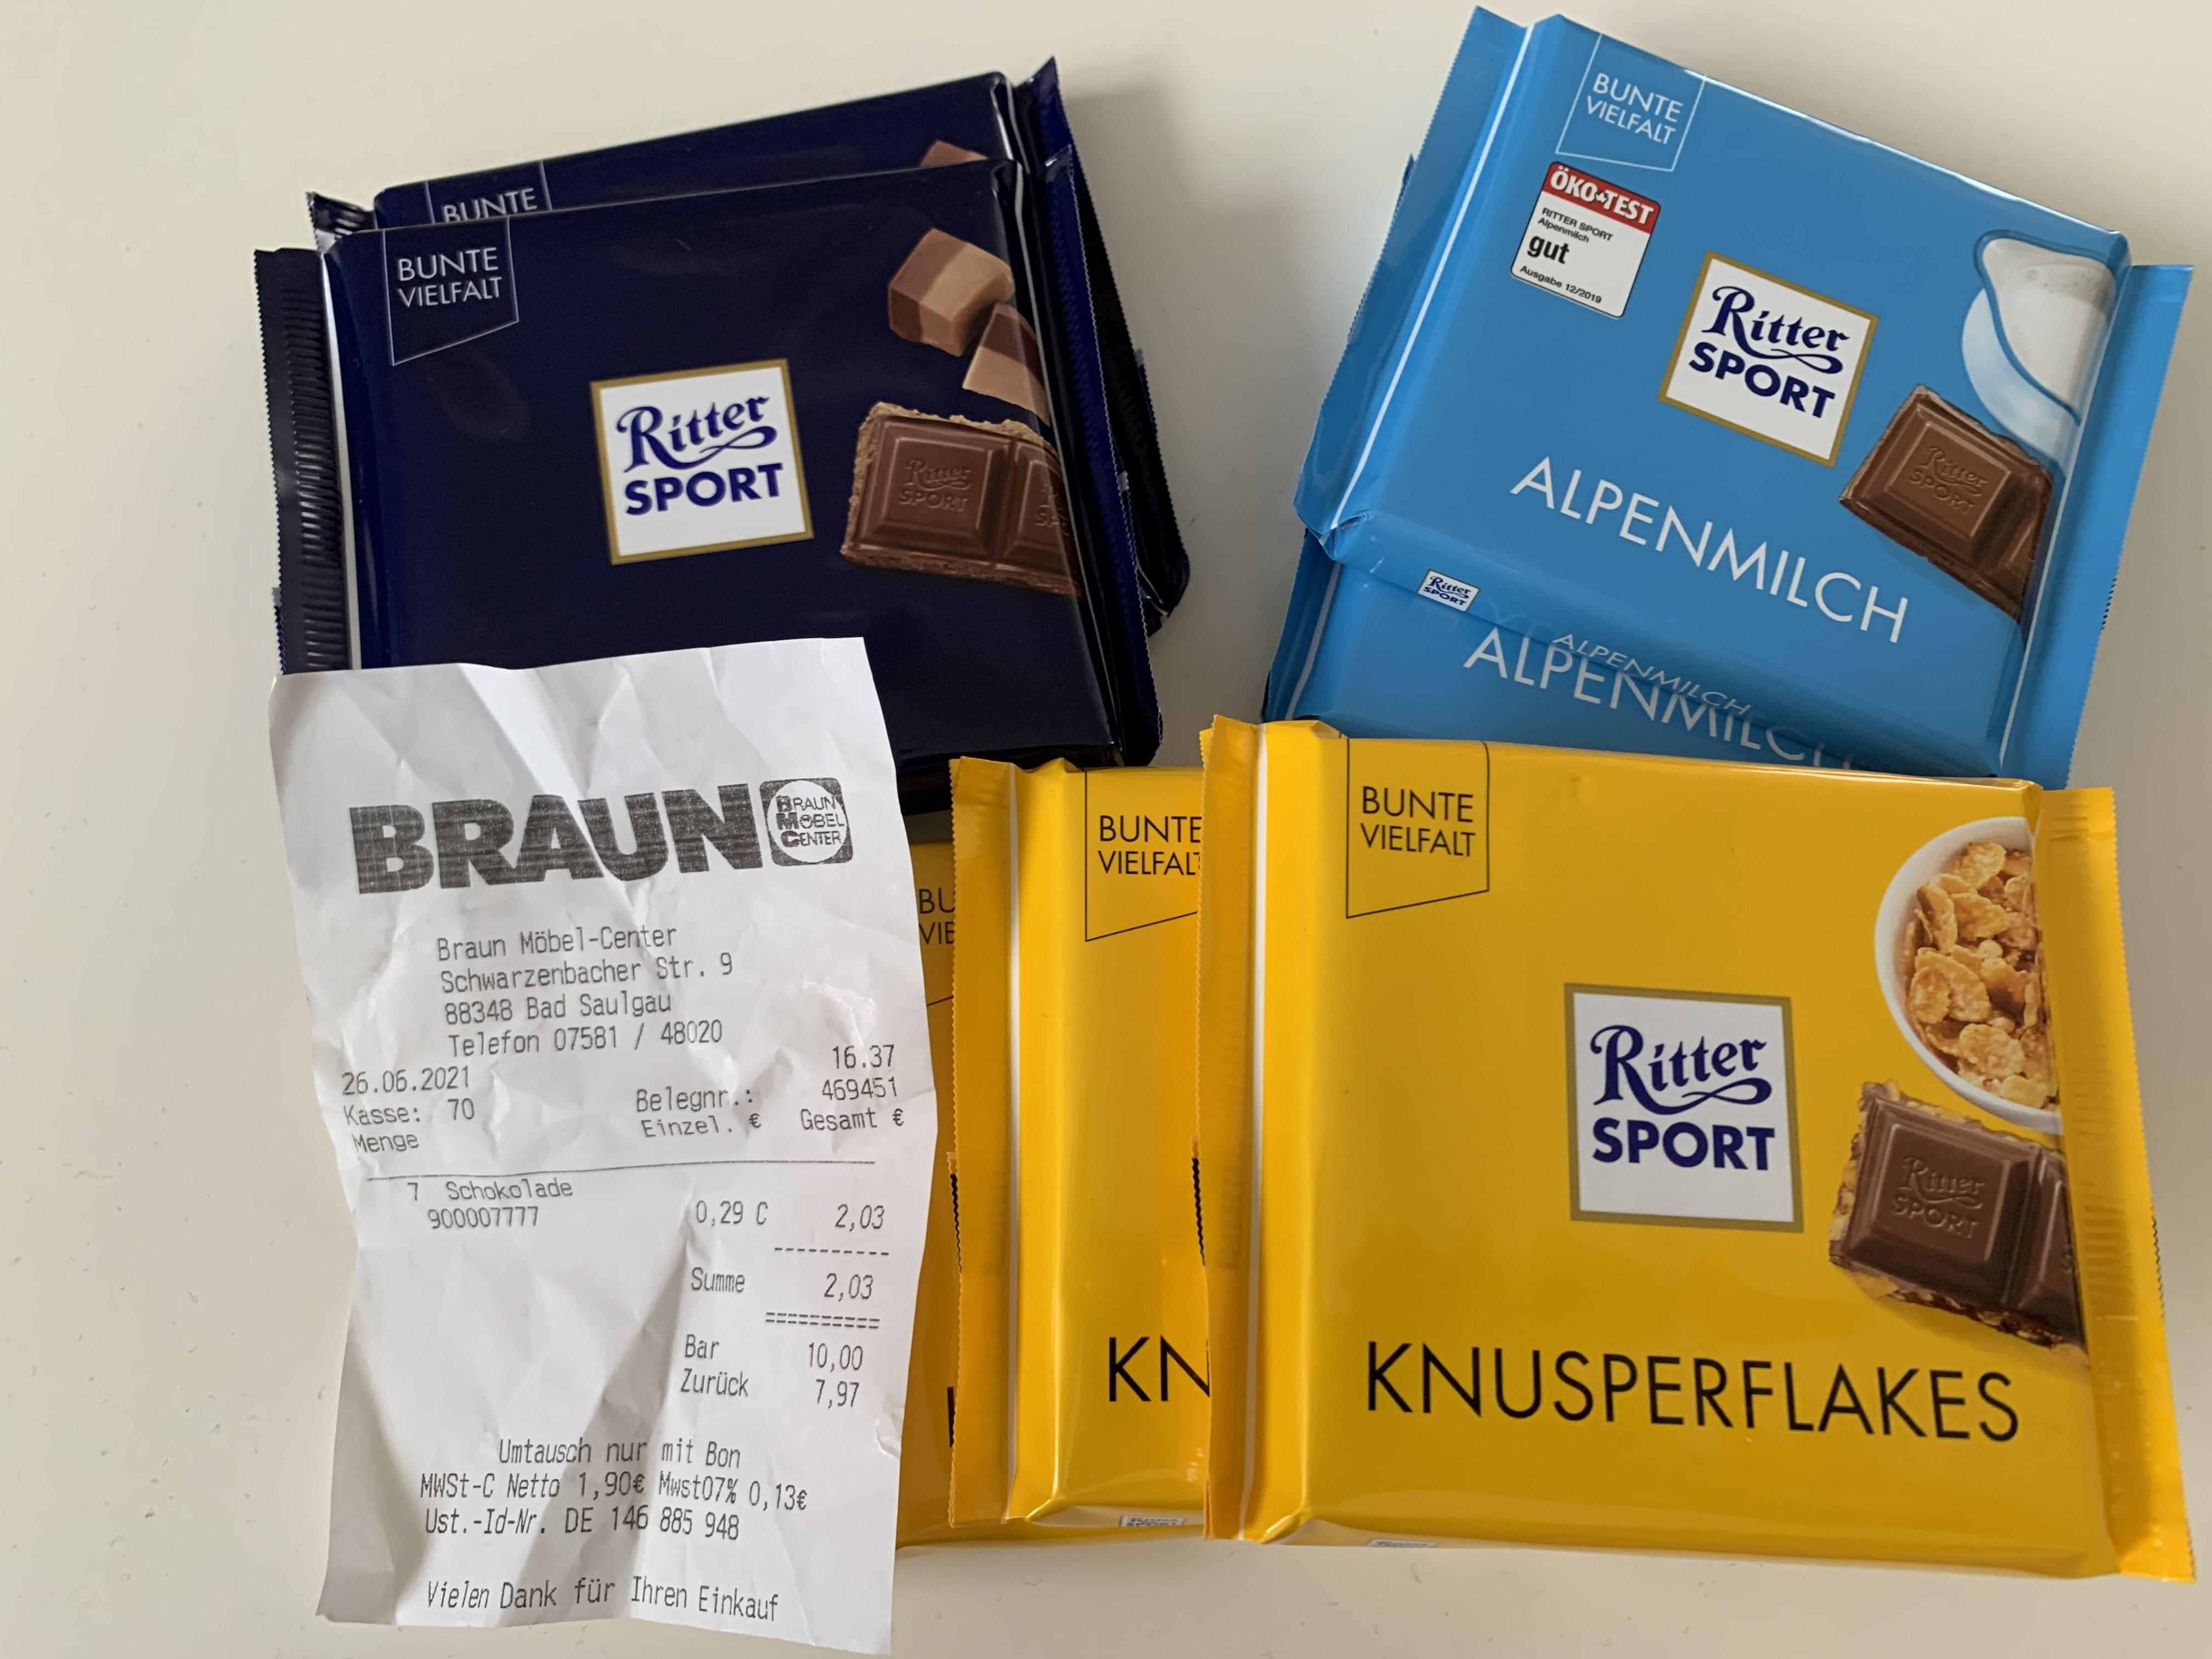 [LOKAL Bad Saulgau] Ritter Sport Schokolade für 0,29€